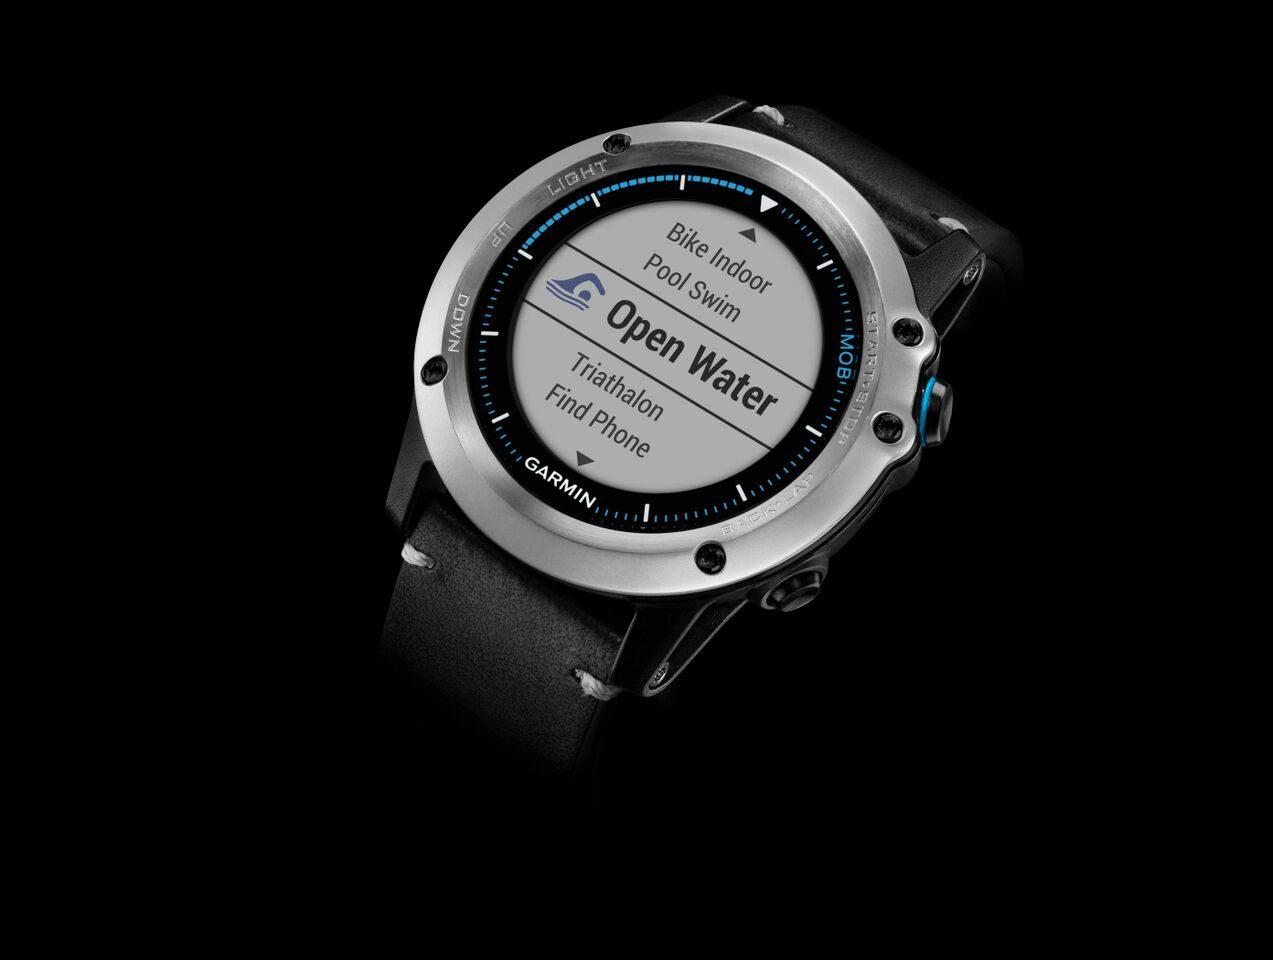 Smartwacht Garmin Quantix